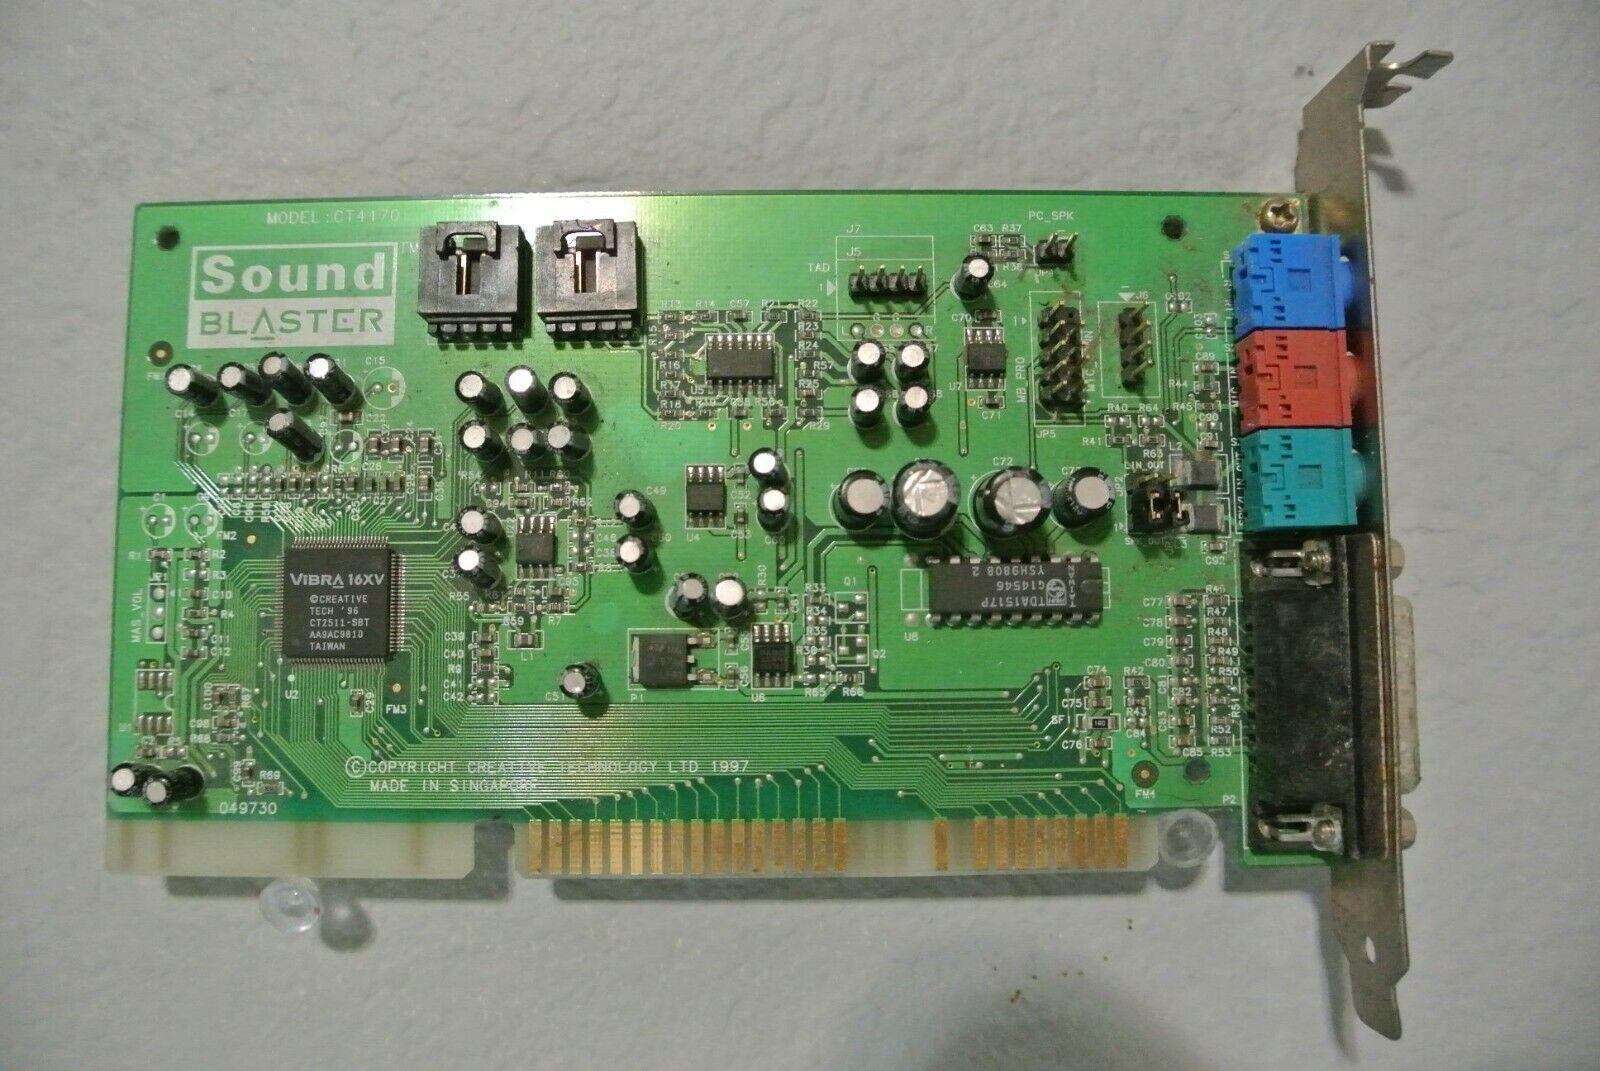  Creative Sound Blaster 16 VIBRA 16XV CT4170 4170 …